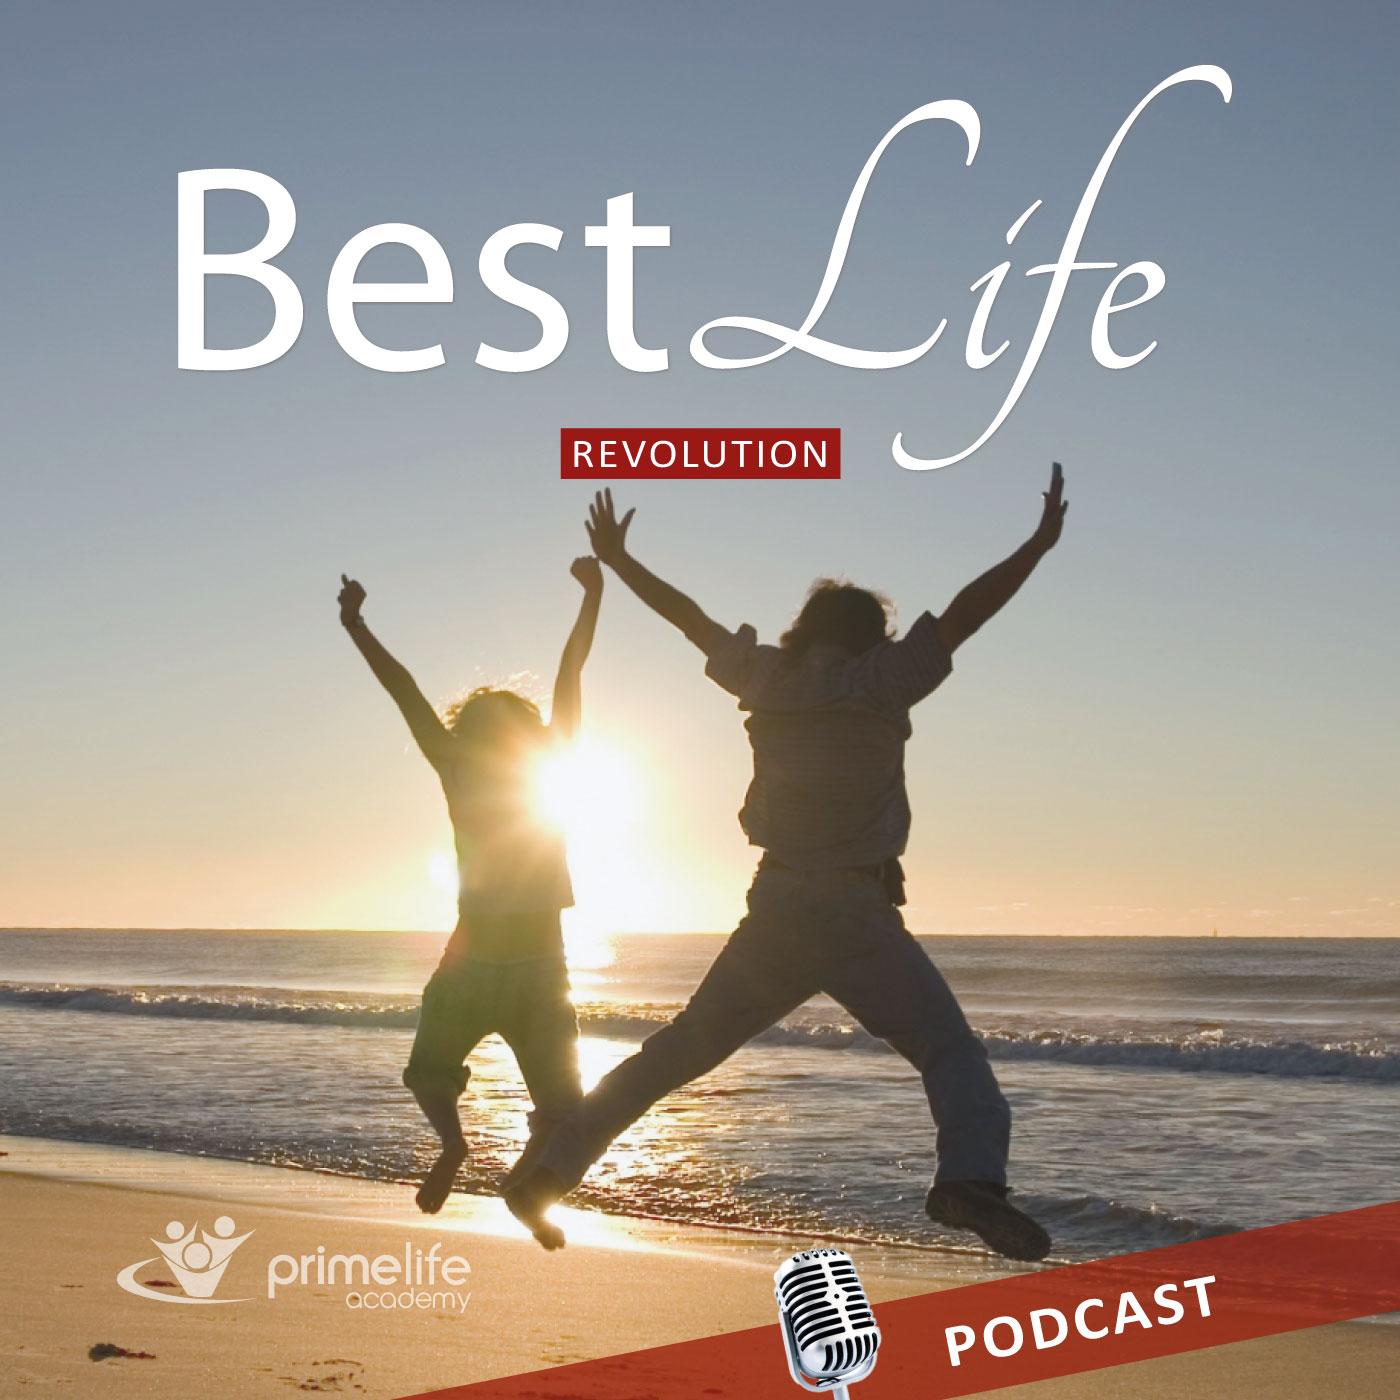 Die BESTLIFE-REVOLUTION | Primelife Academy